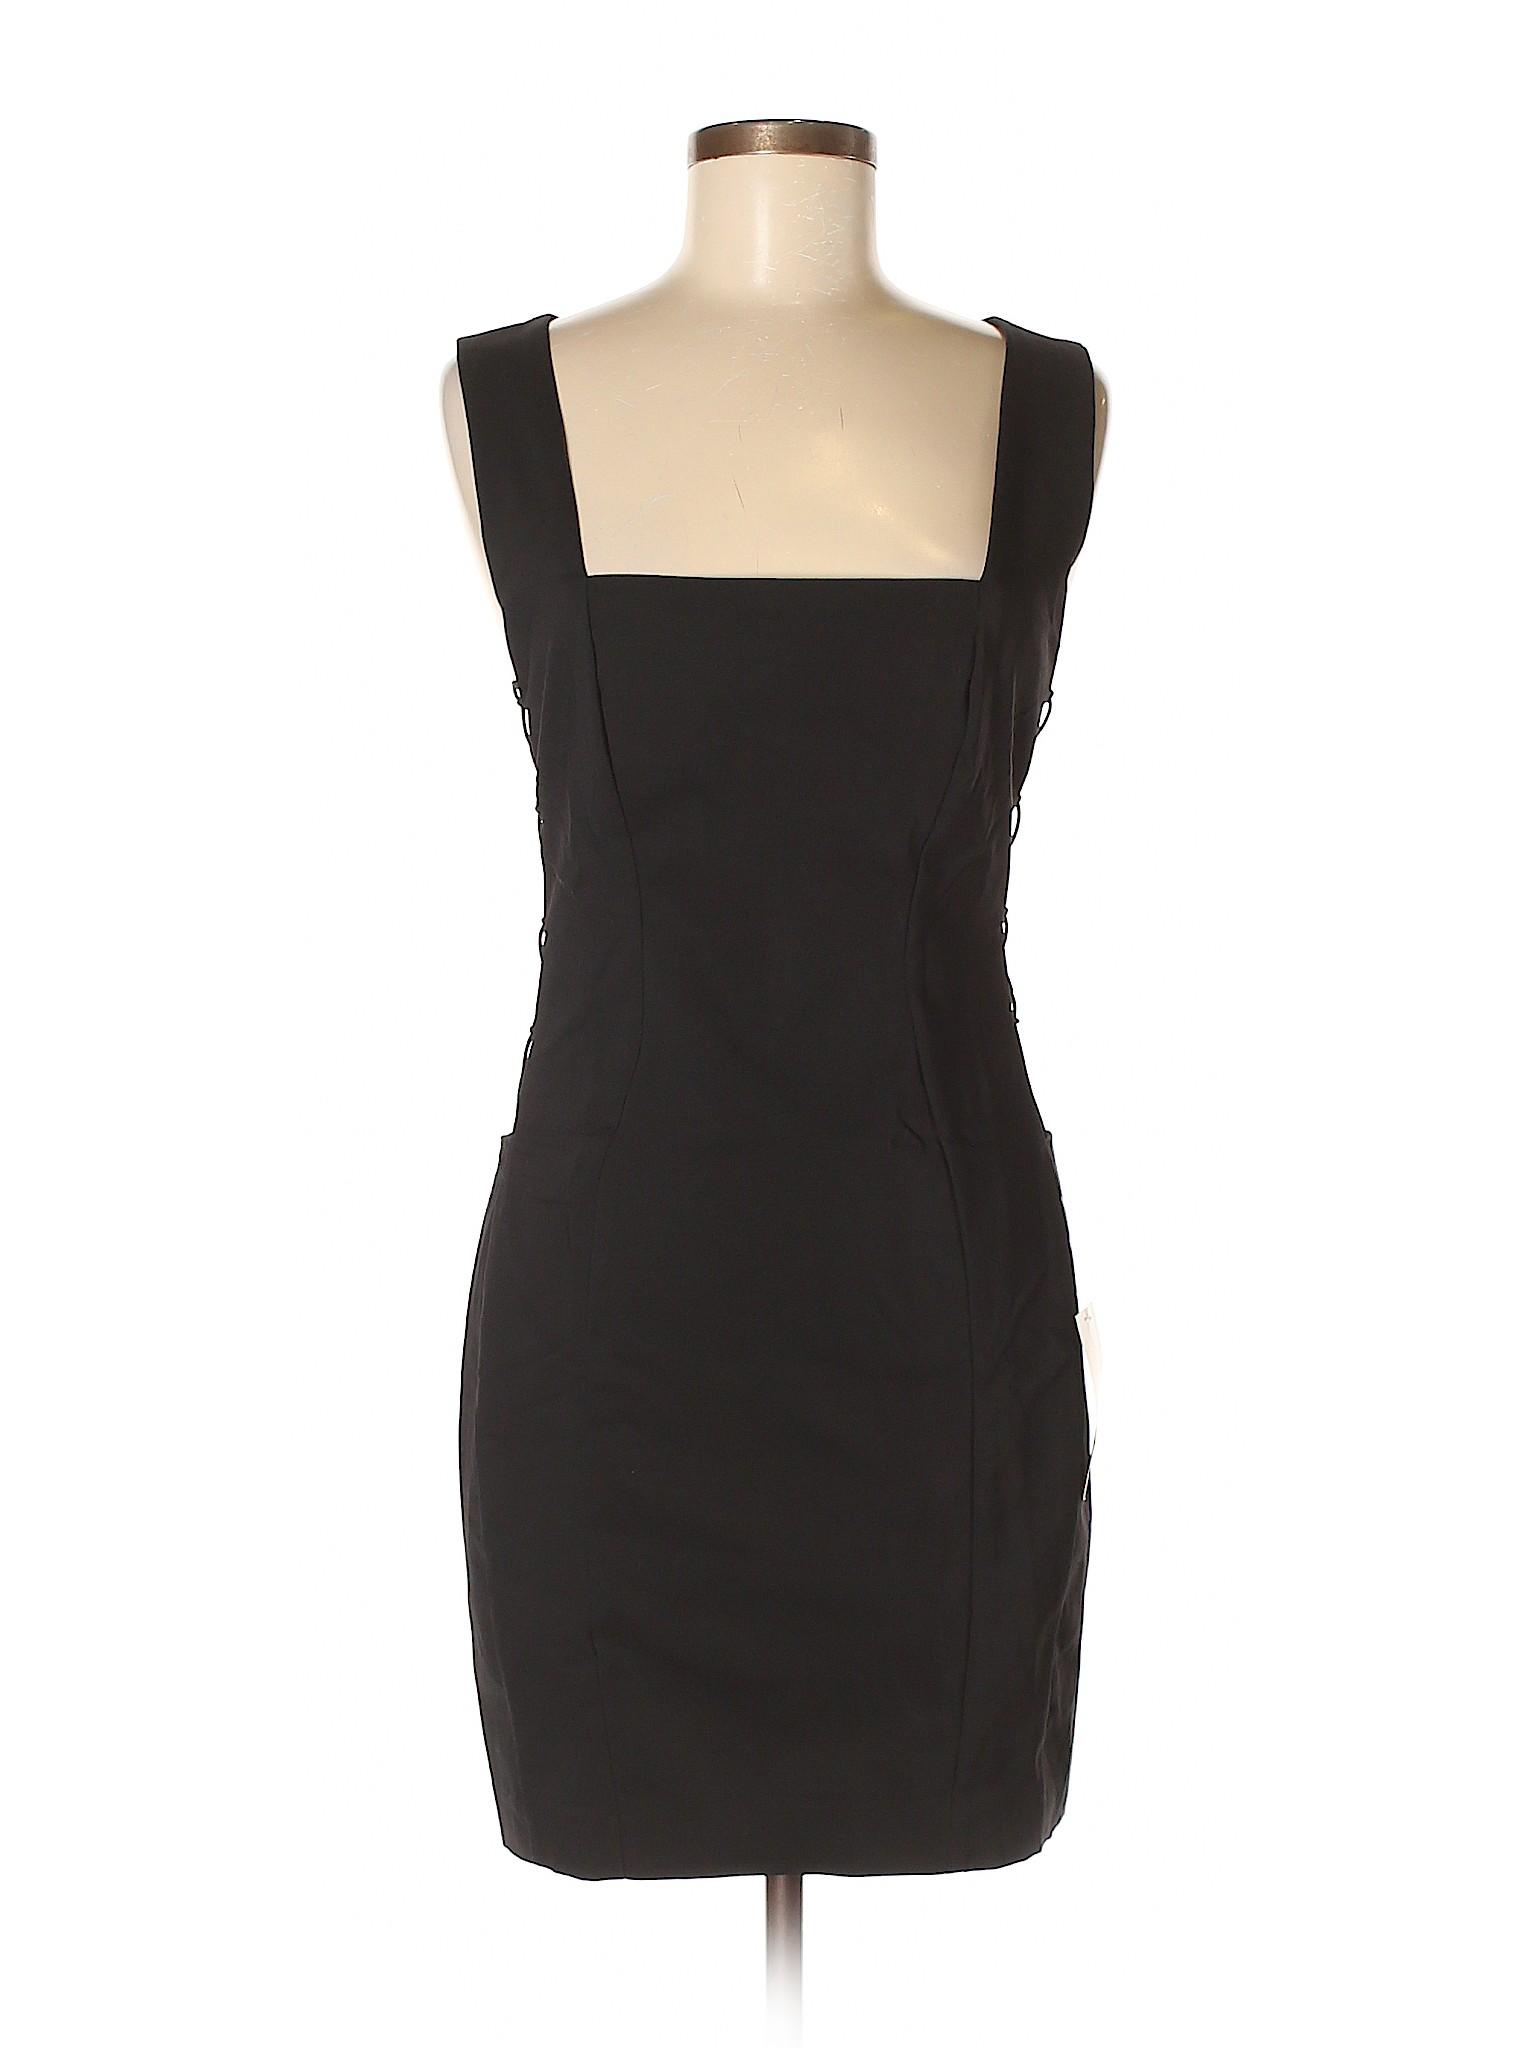 TOBI TOBI Casual Dress Selling Casual TOBI TOBI Selling Dress Dress Casual Selling Casual Dress Selling dXXT8z